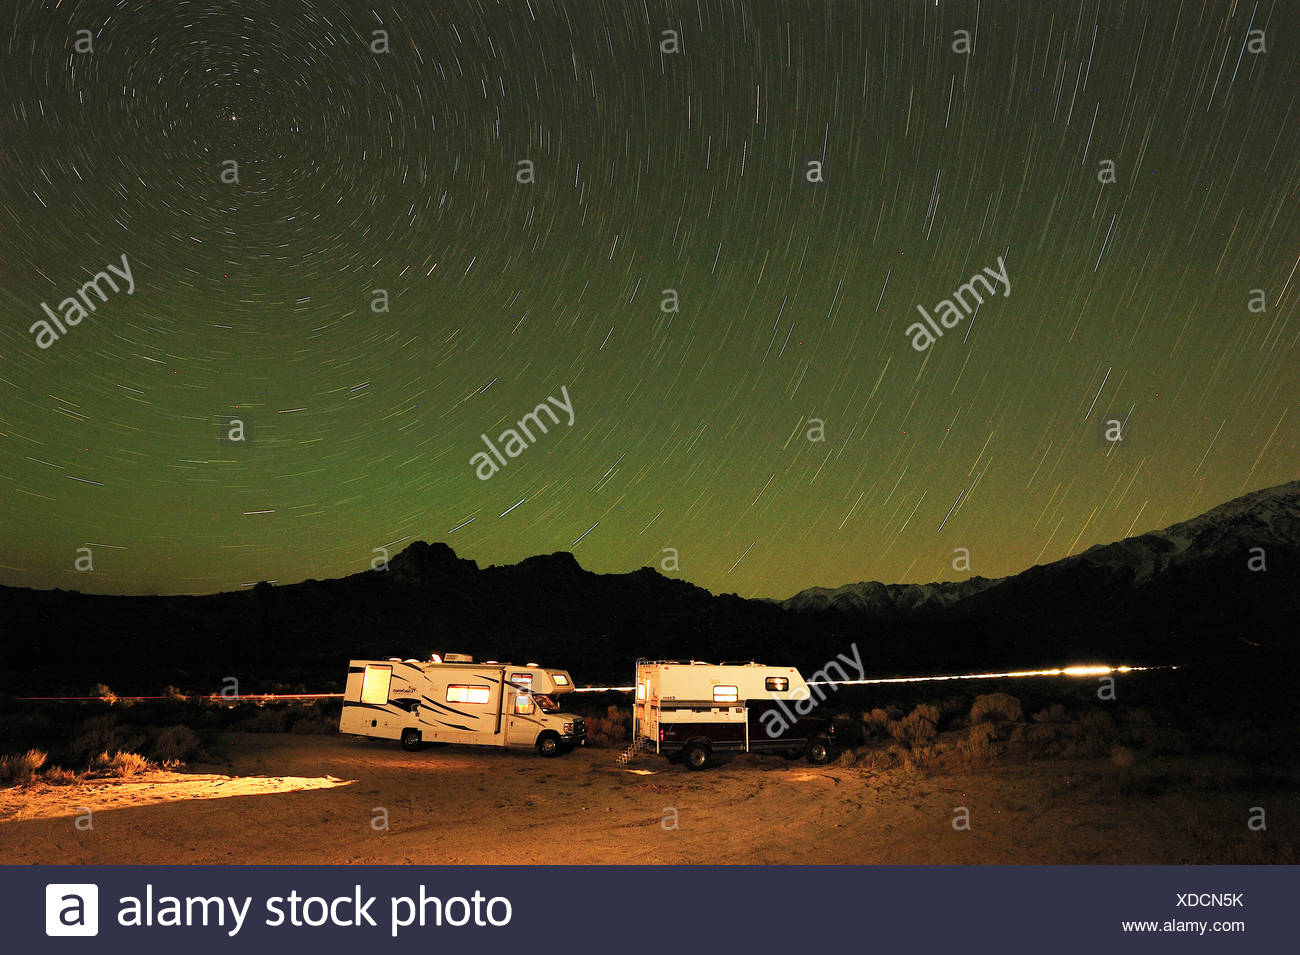 RV, Camper, stars, night sky, near Sierra Nevada, near Mammoth Lakes, California, USA, United States, America, - Stock Image